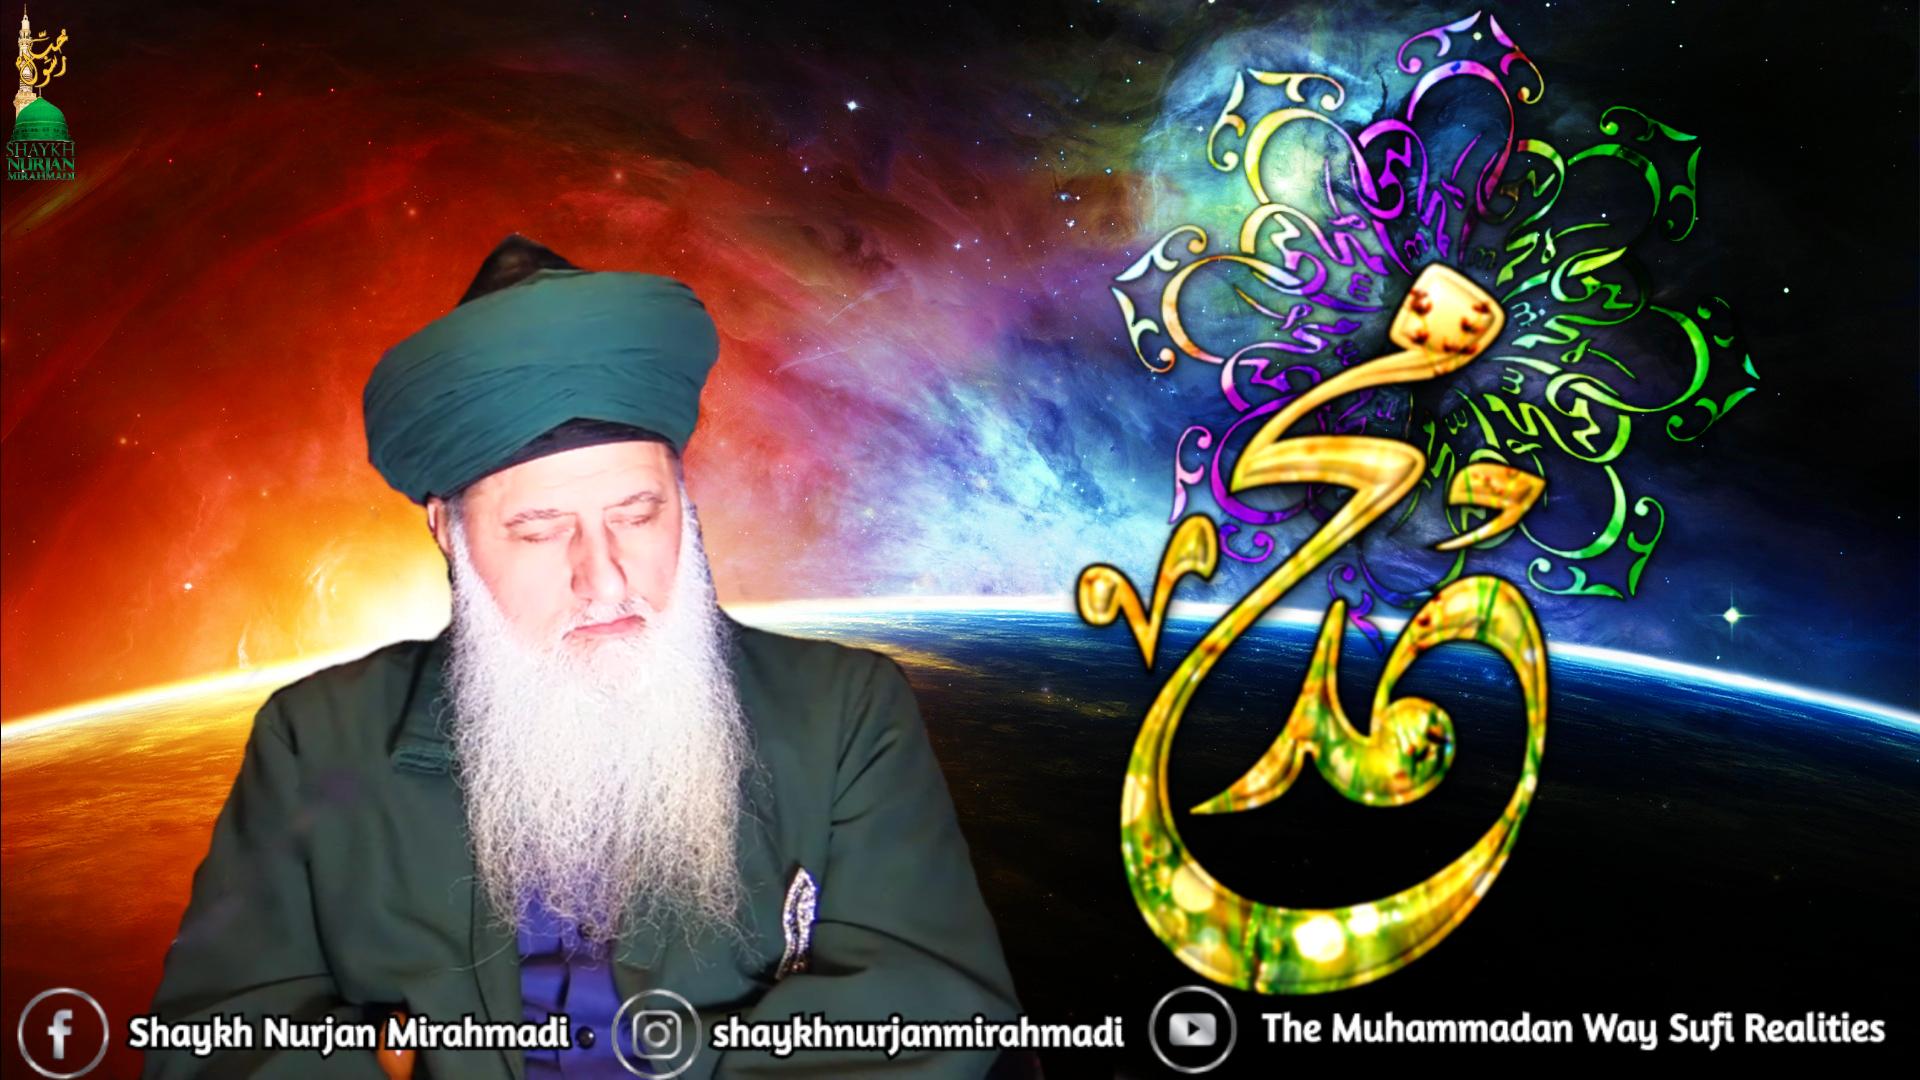 Shaykh Nurjan-golden Muhammad (s)-space meditation khalwah seclusion